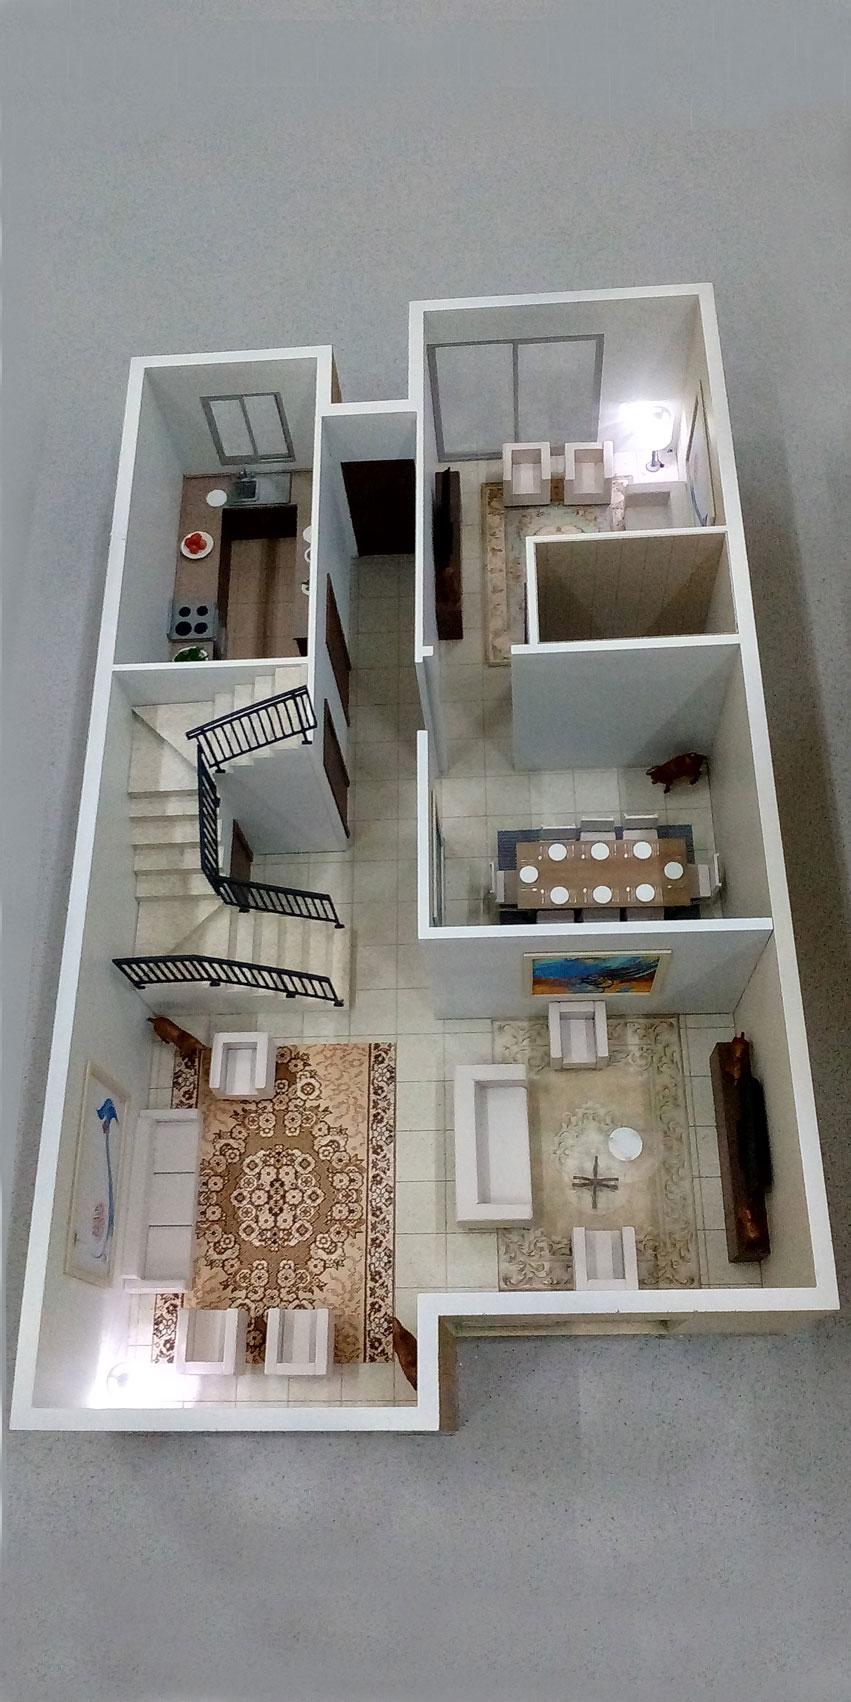 Scale Model - Architectural - Villas - Villa type 2, ground floor - UAE